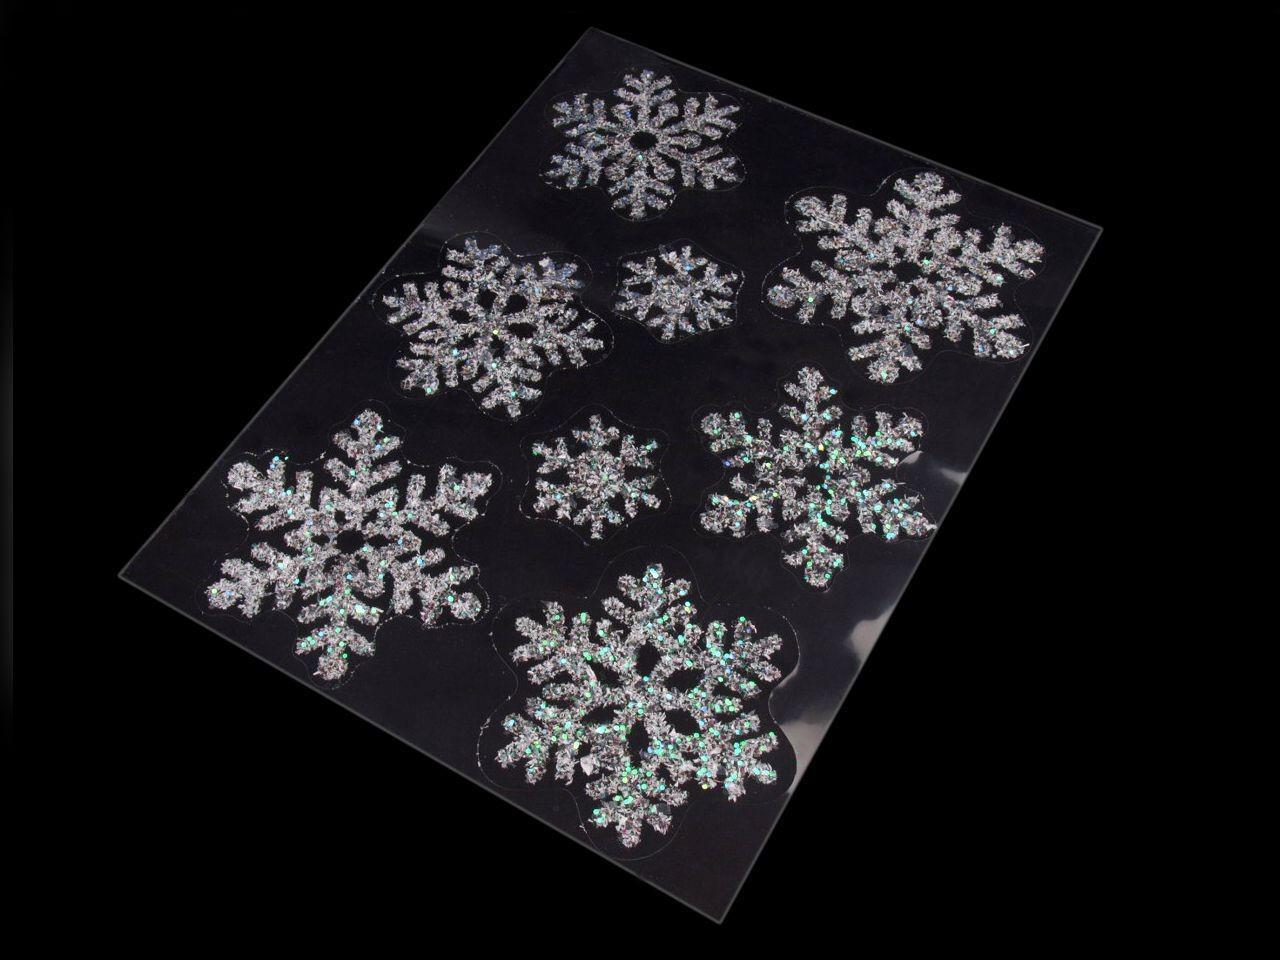 Samolepící dekorace vločky na sklo 1karta - 131 Kč / karta bílá AB